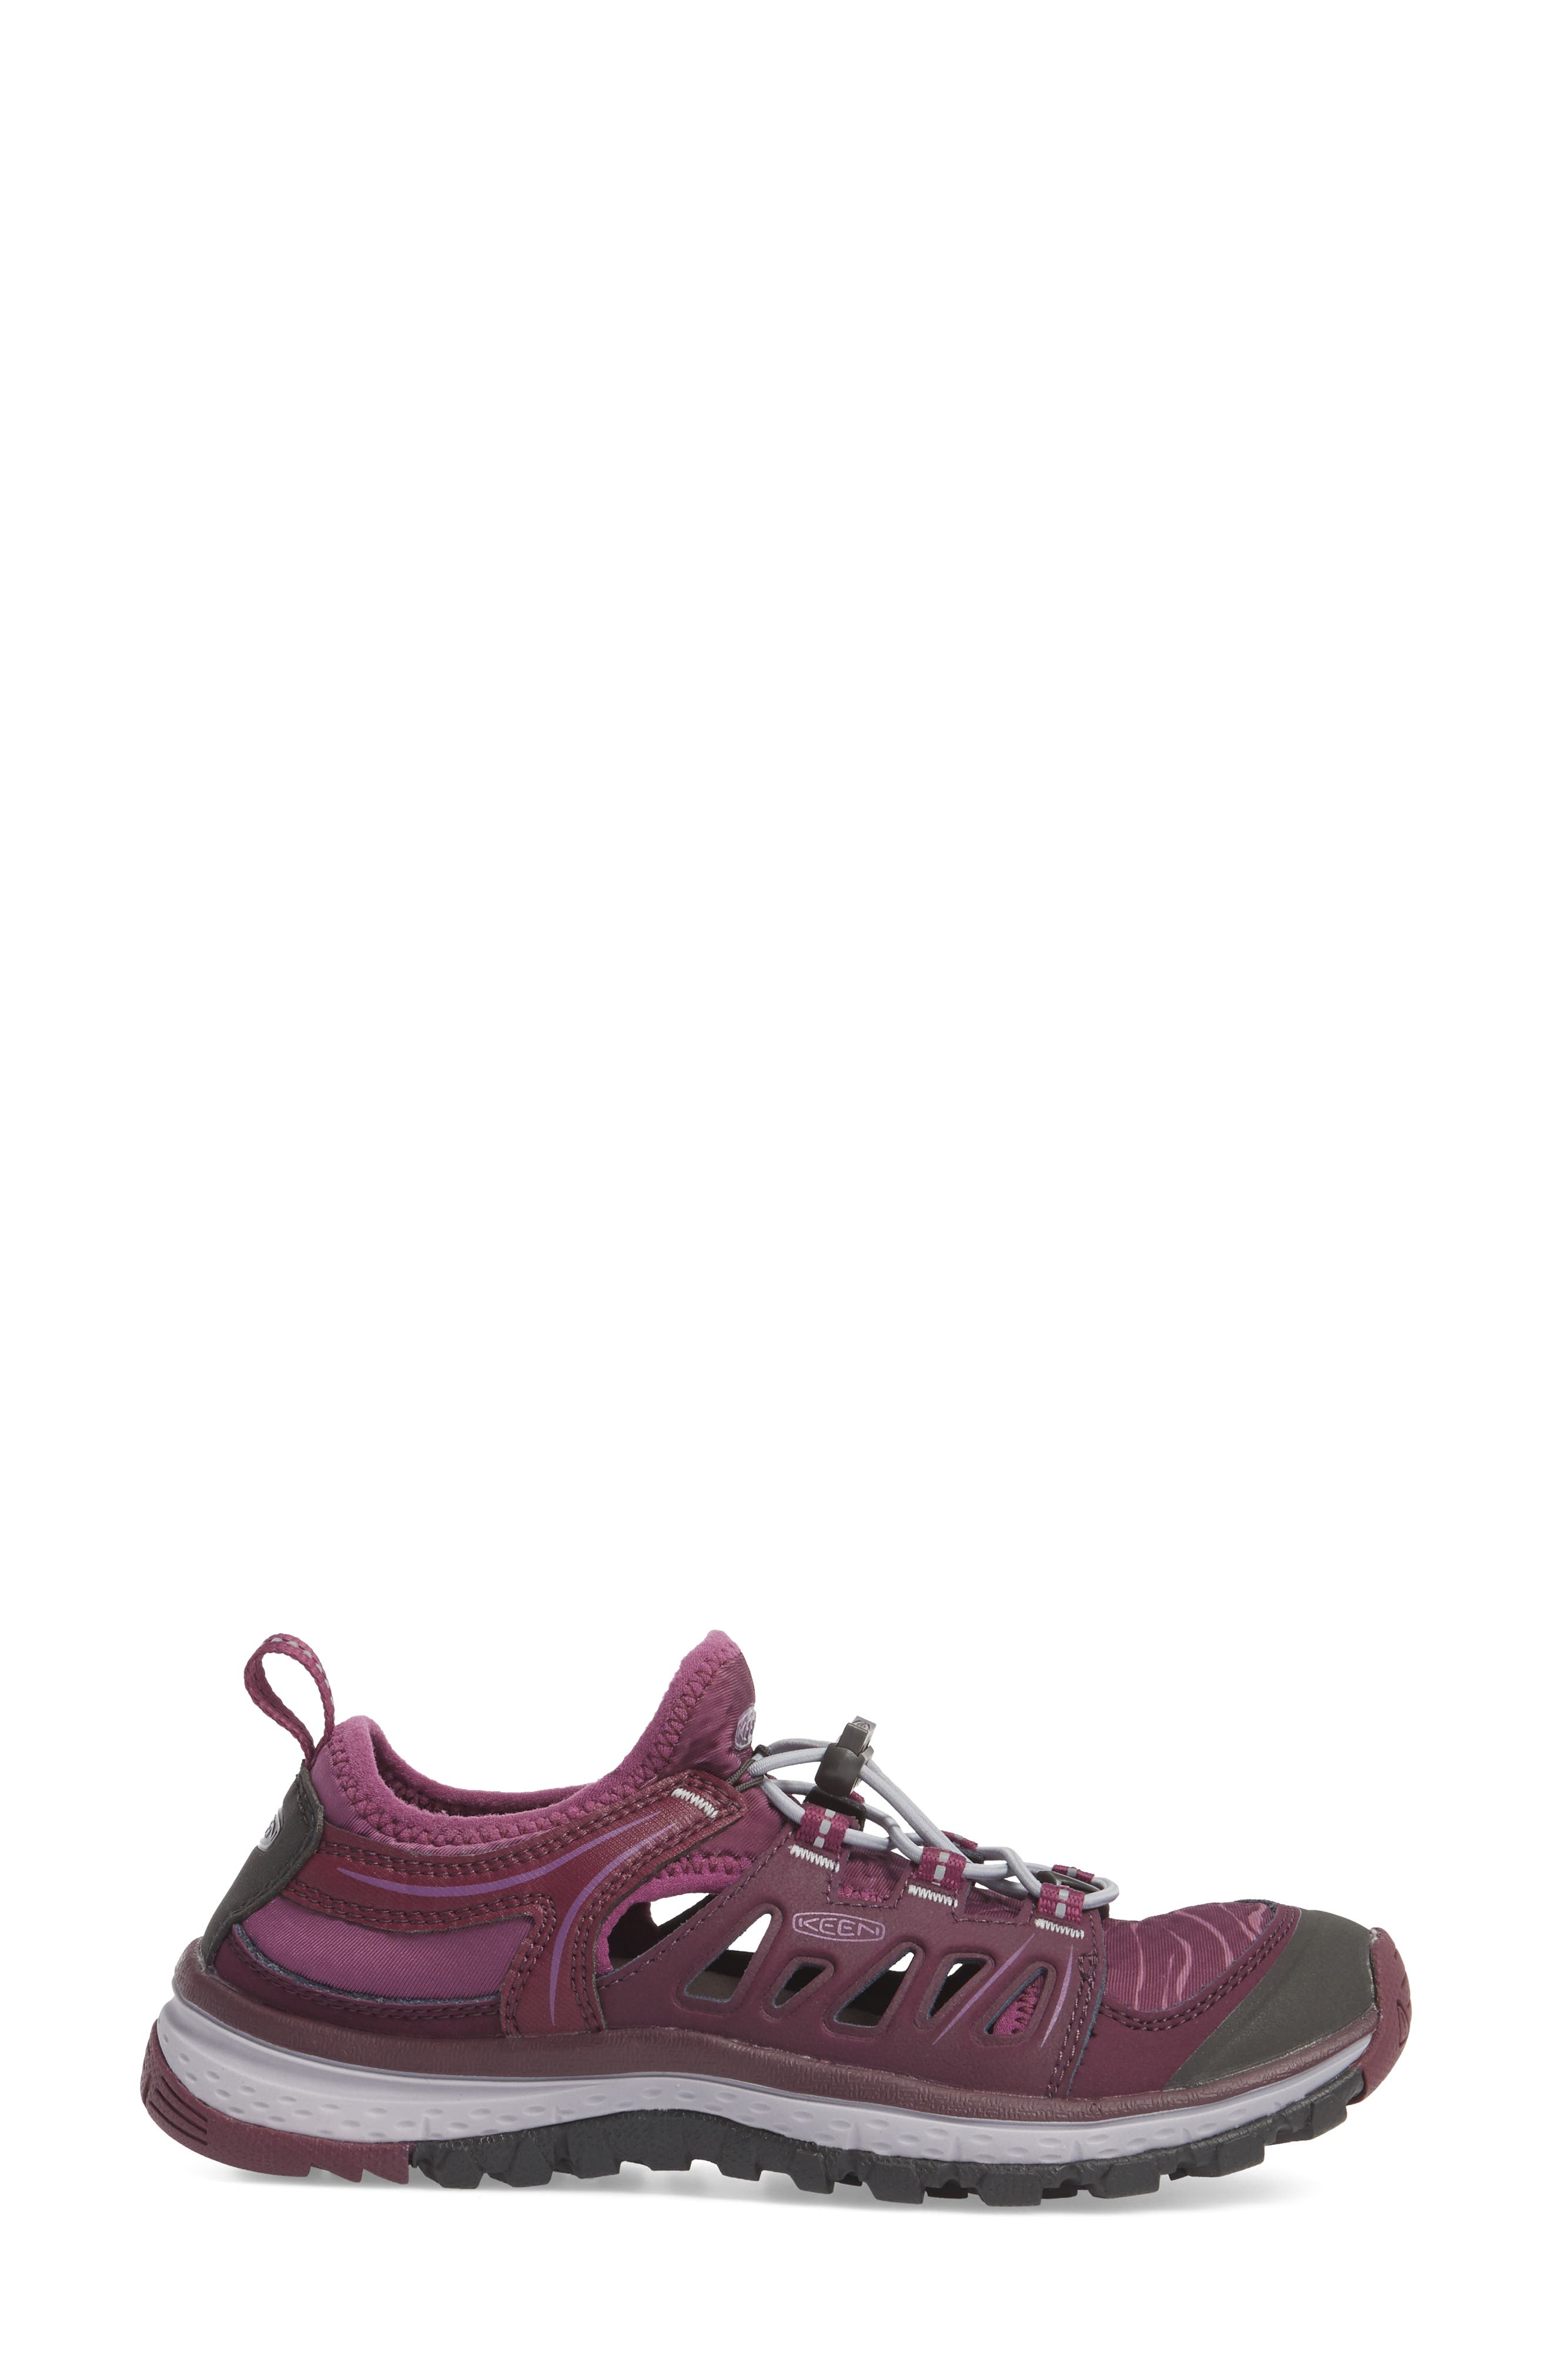 Terradora Ethos Hiking Sneaker,                             Alternate thumbnail 9, color,